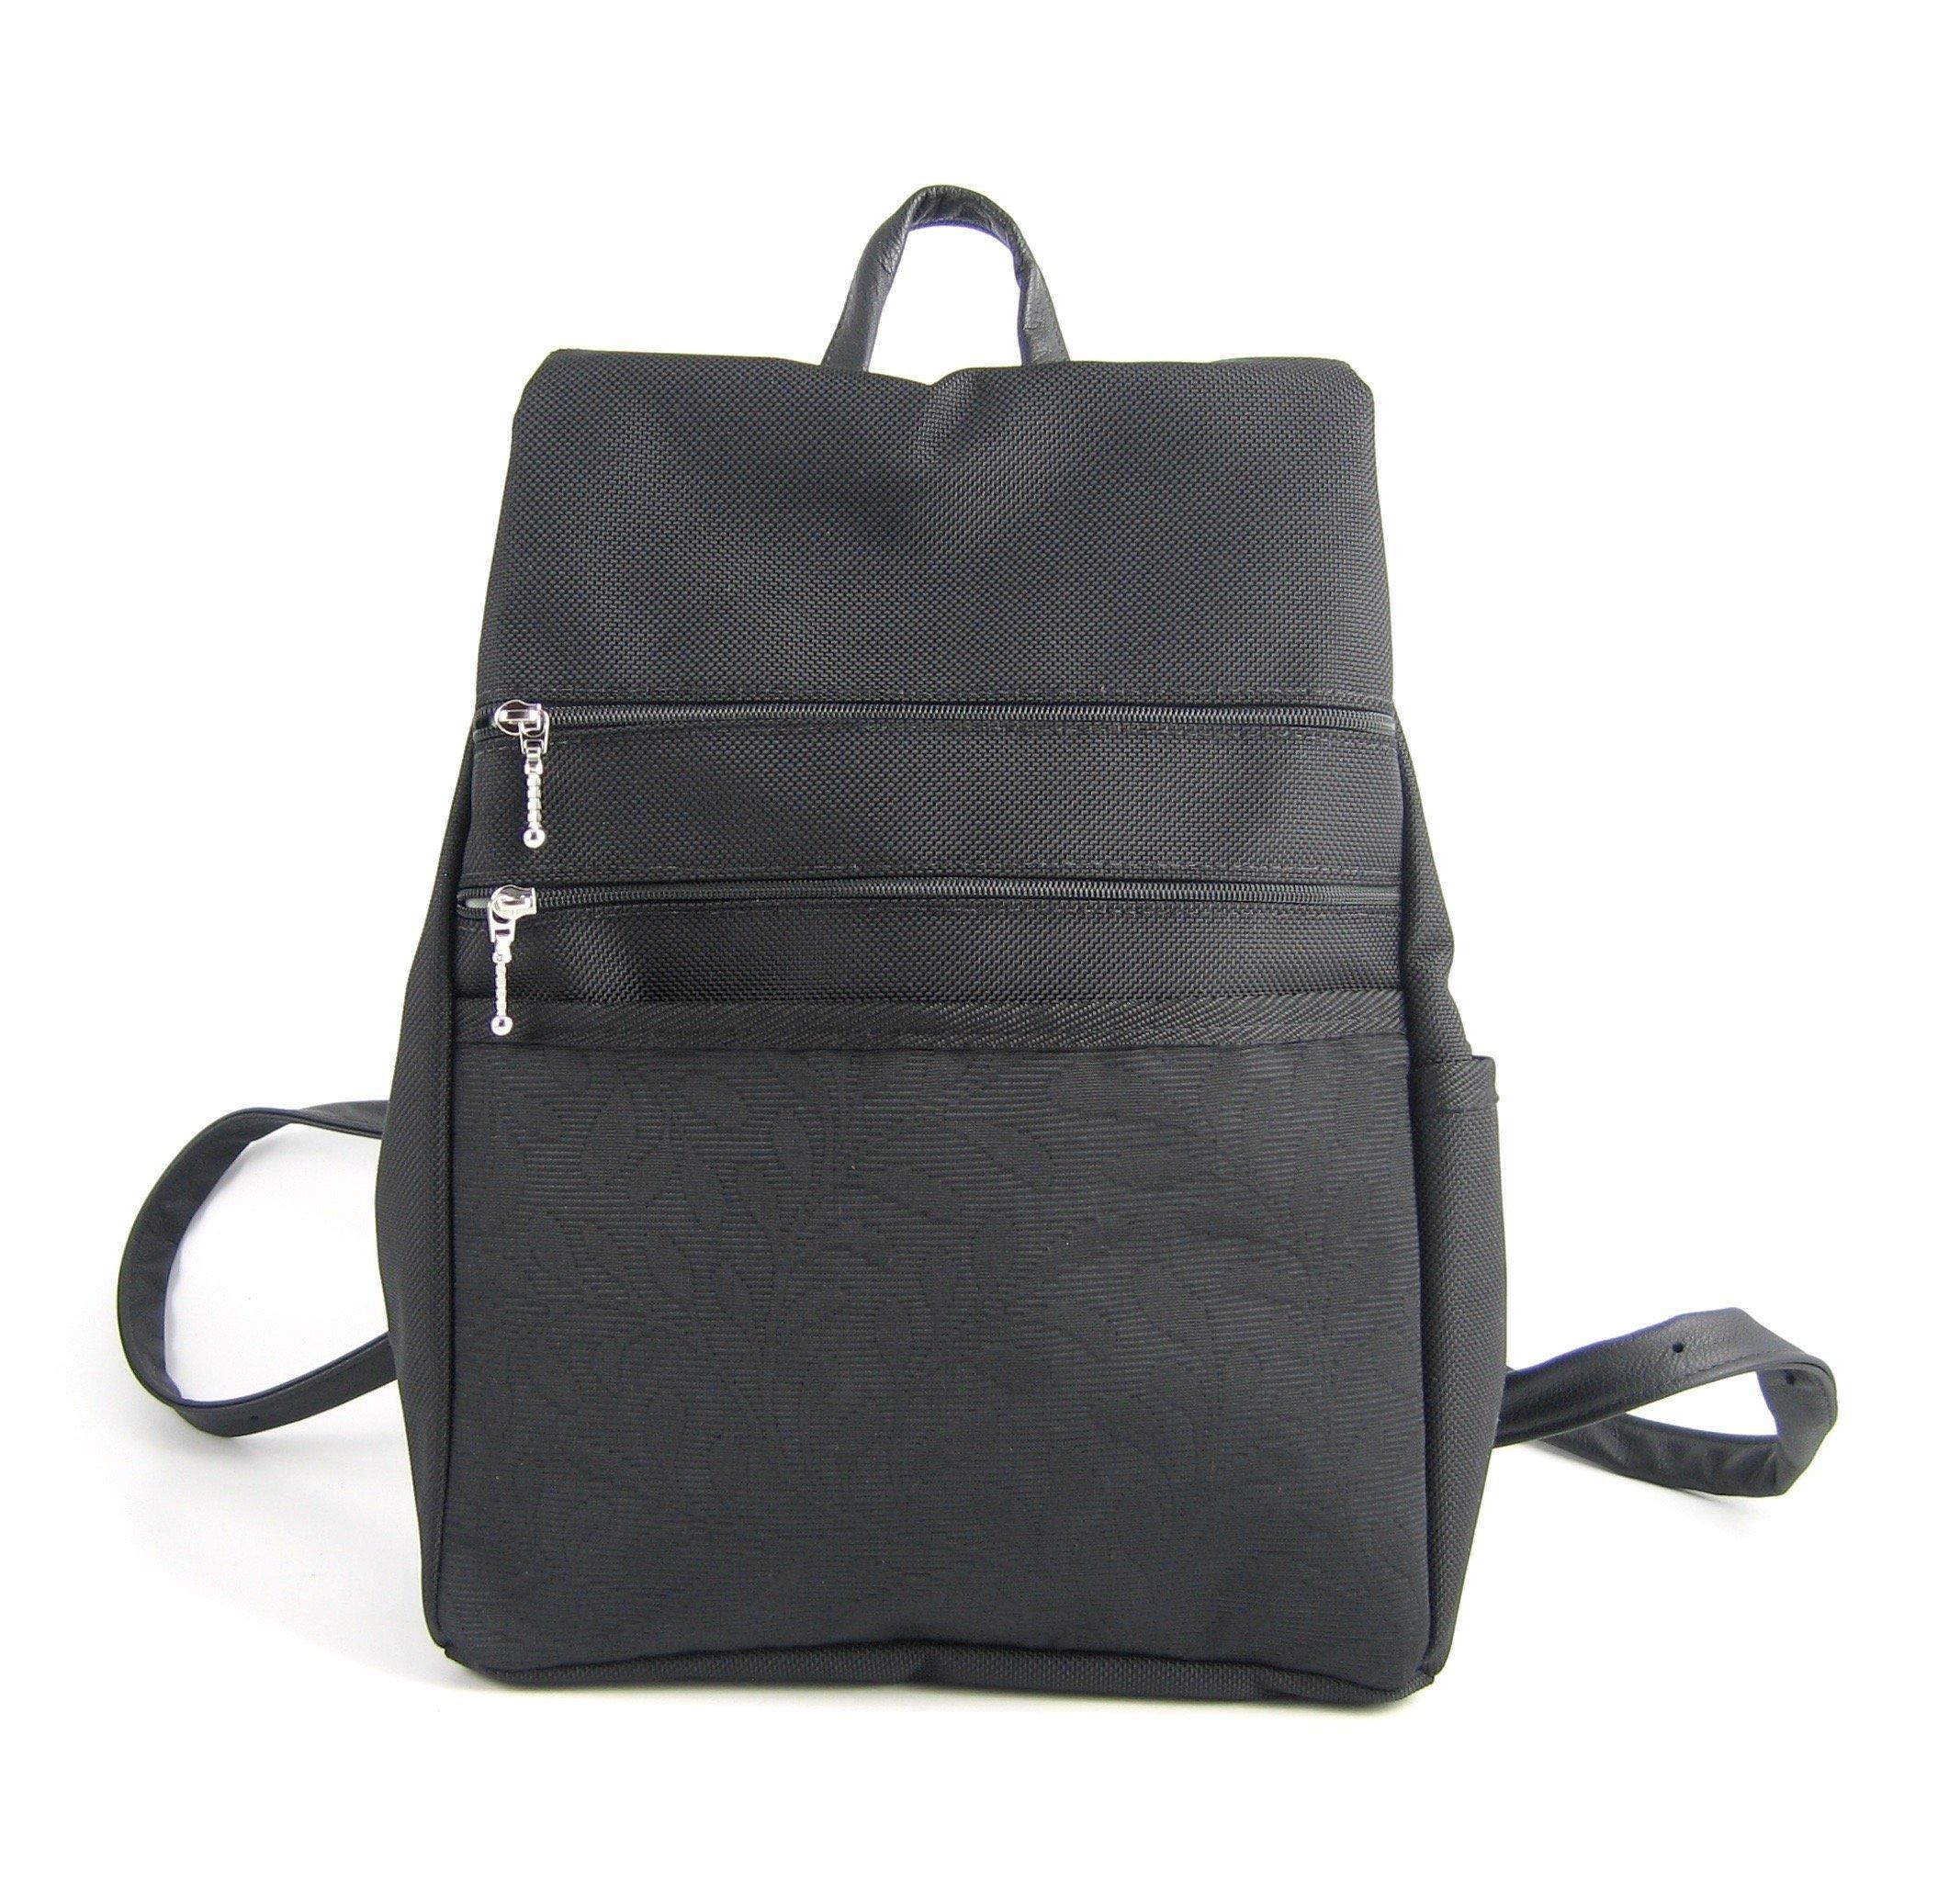 GreatBags Med Backpack Purse, Black Side Entry G20L